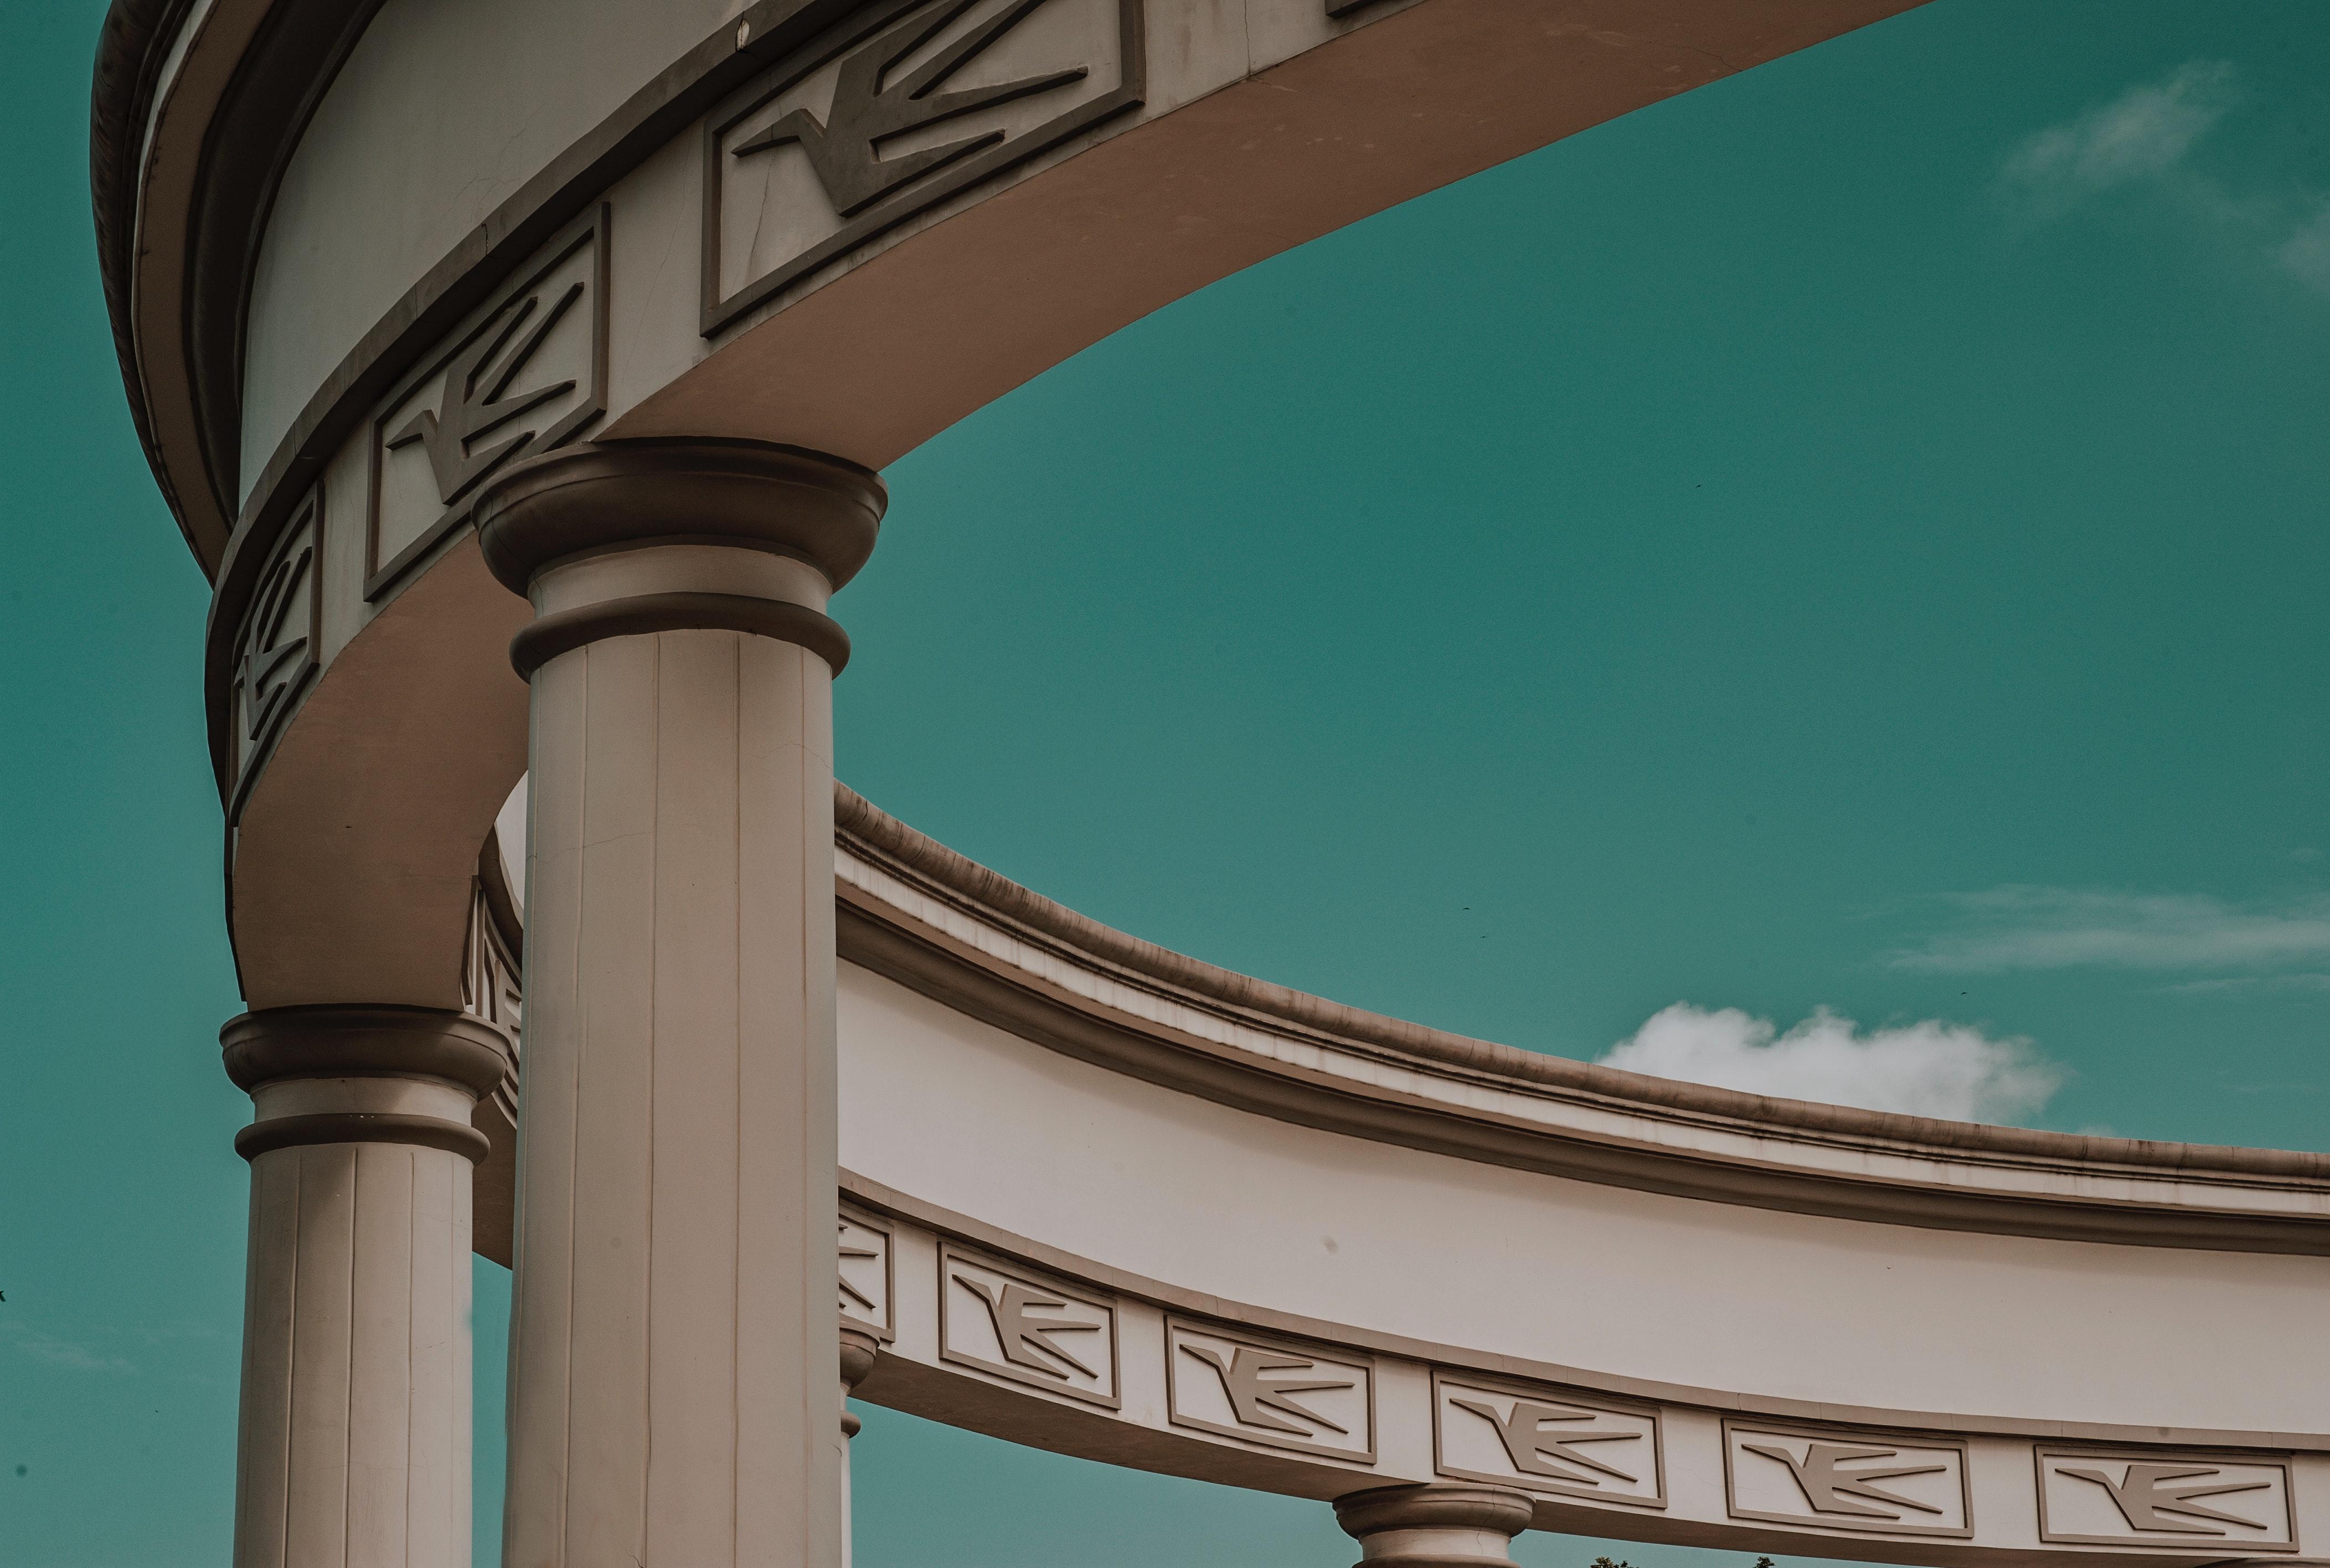 Close Up Photography of Concrete Column Building, Landmark, Design, Low angle shot, Outdoors, HQ Photo